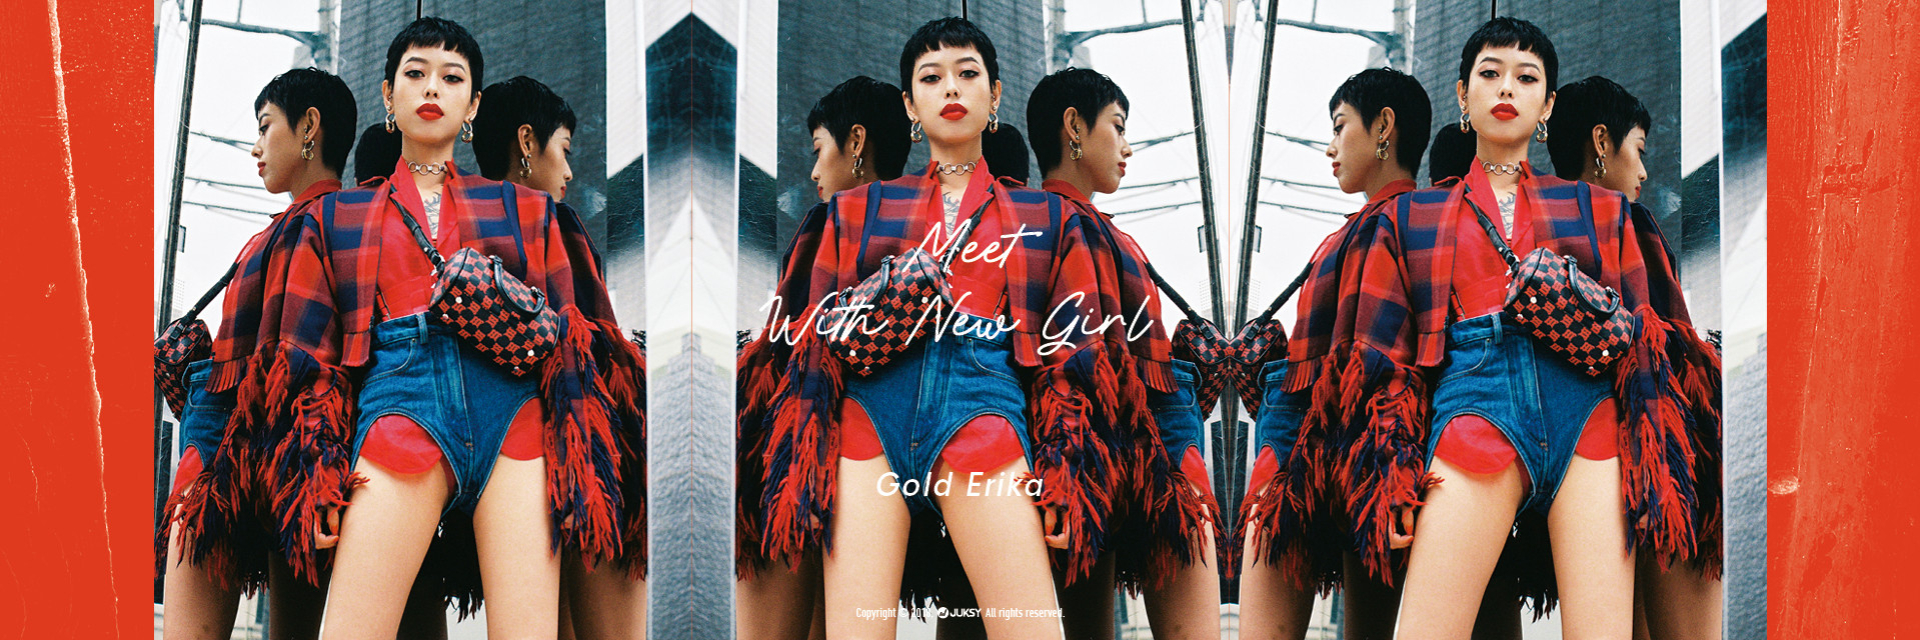 【 Meet With New Girl 】具殺氣的青文字系代表!活躍日本時尚圈的中國籍 KOL - Gold Erika